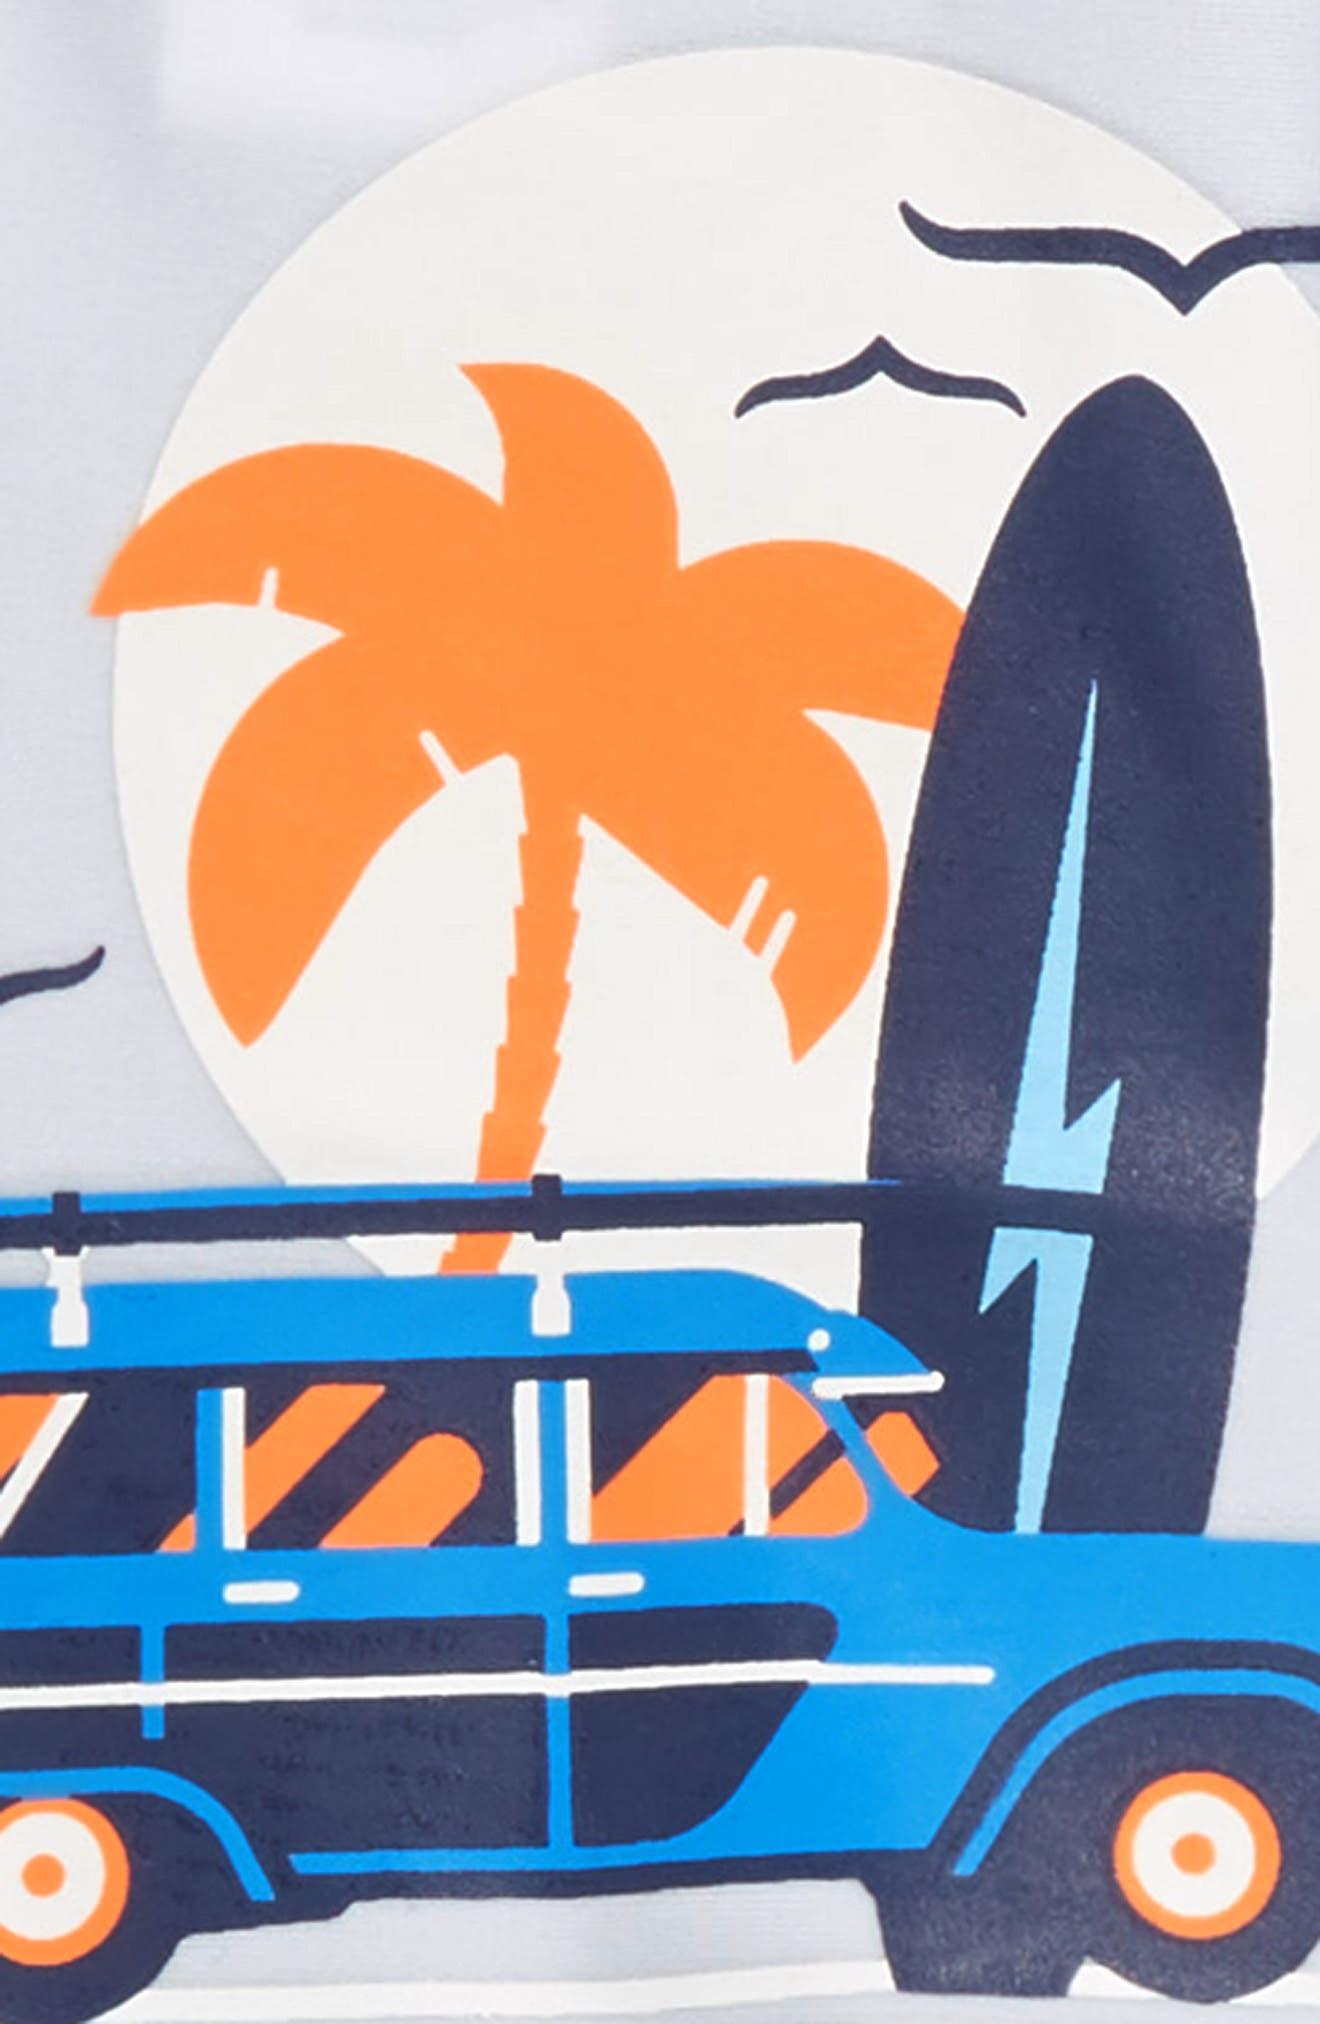 Surf Shop Two-Piece Rashguard Swimsuit,                             Alternate thumbnail 2, color,                             White Multi